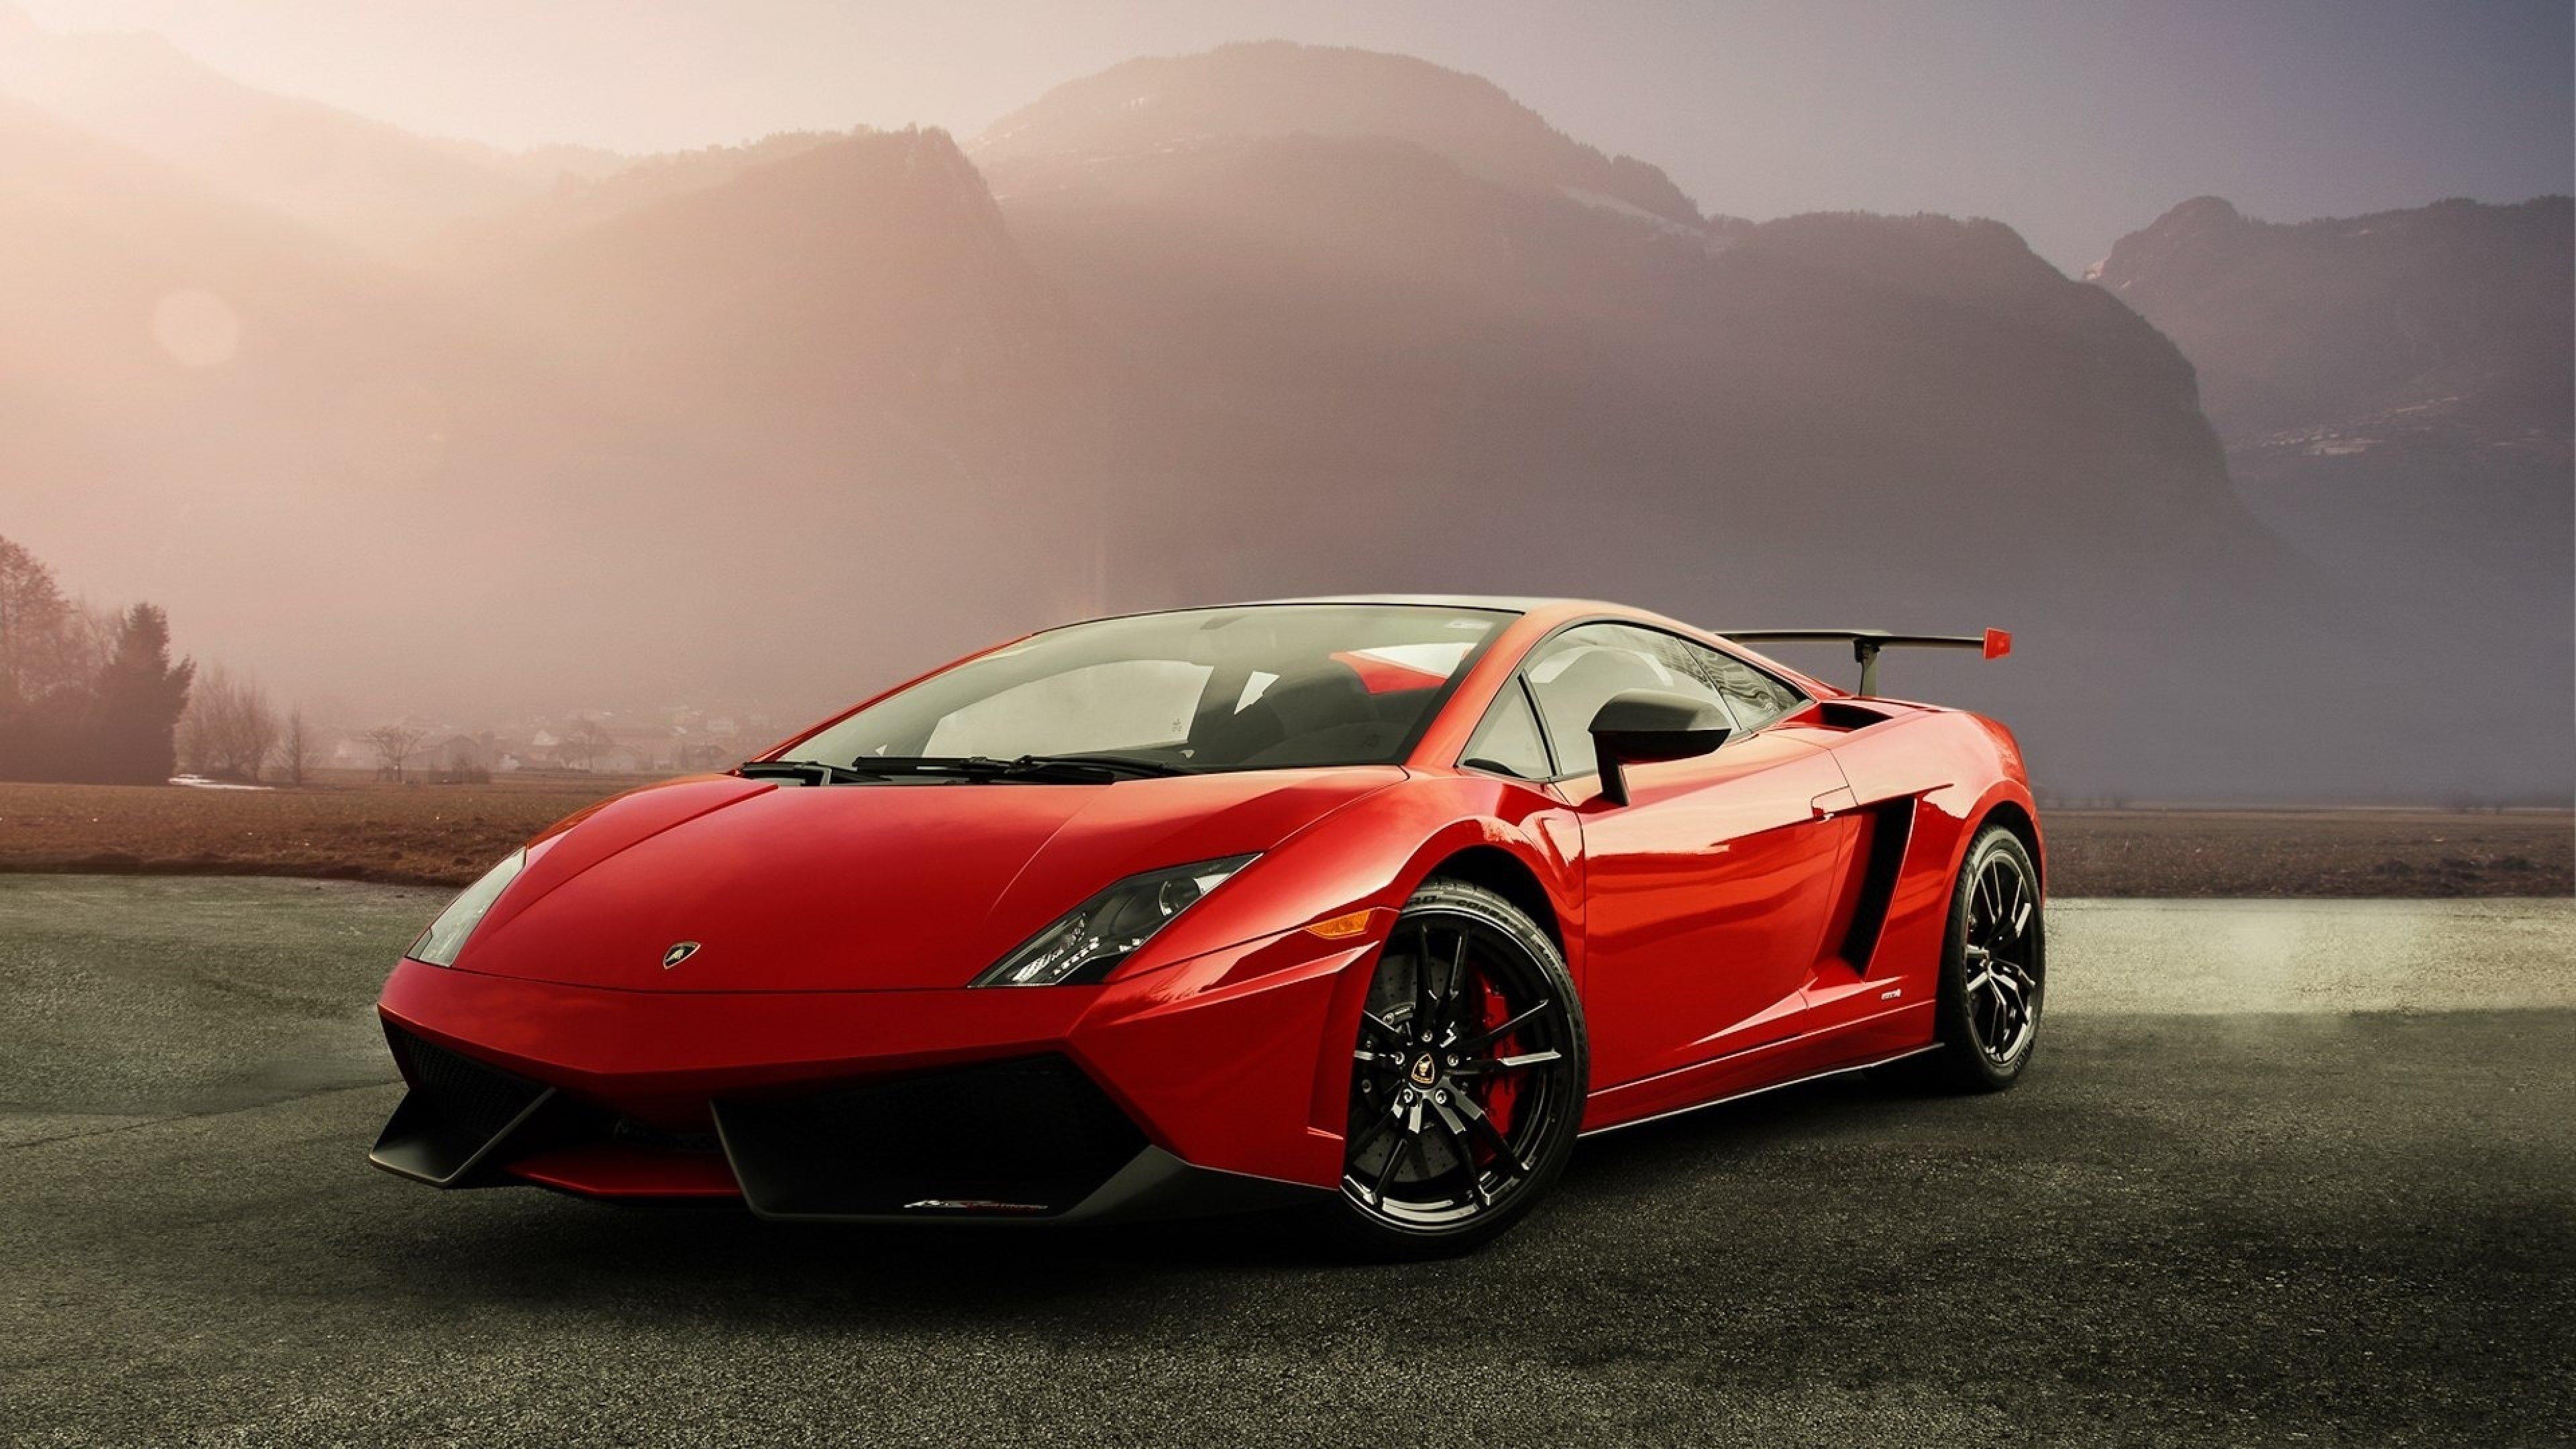 Download Wallpaper 3840x2160 Lamborghini gallardo Cars Car 4K Ultra 3840x2160